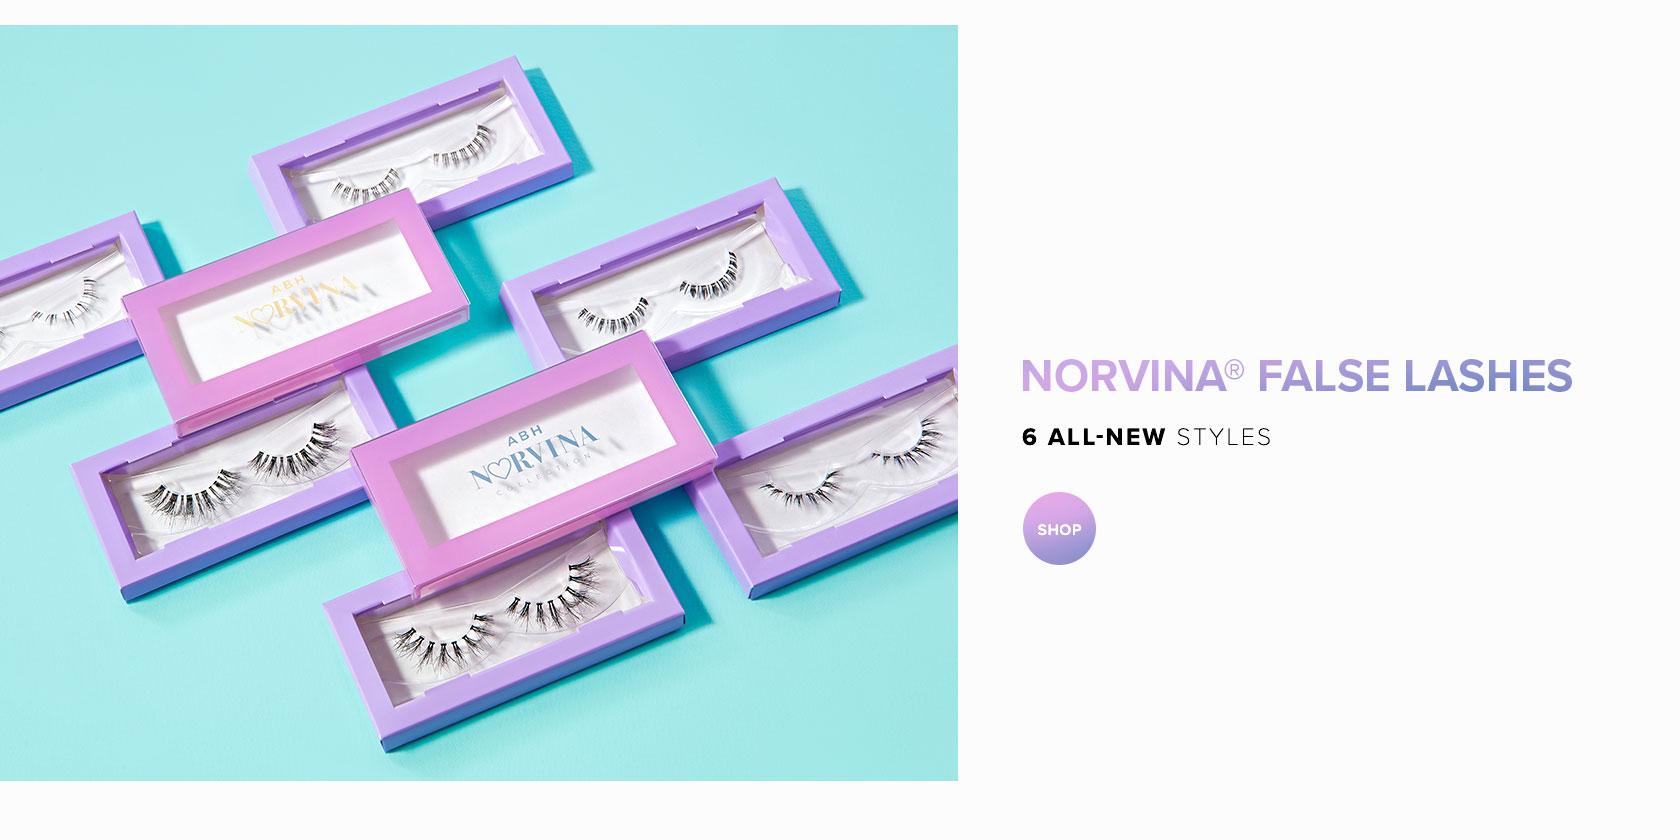 Norvina False Lashes - 6 All New Styles